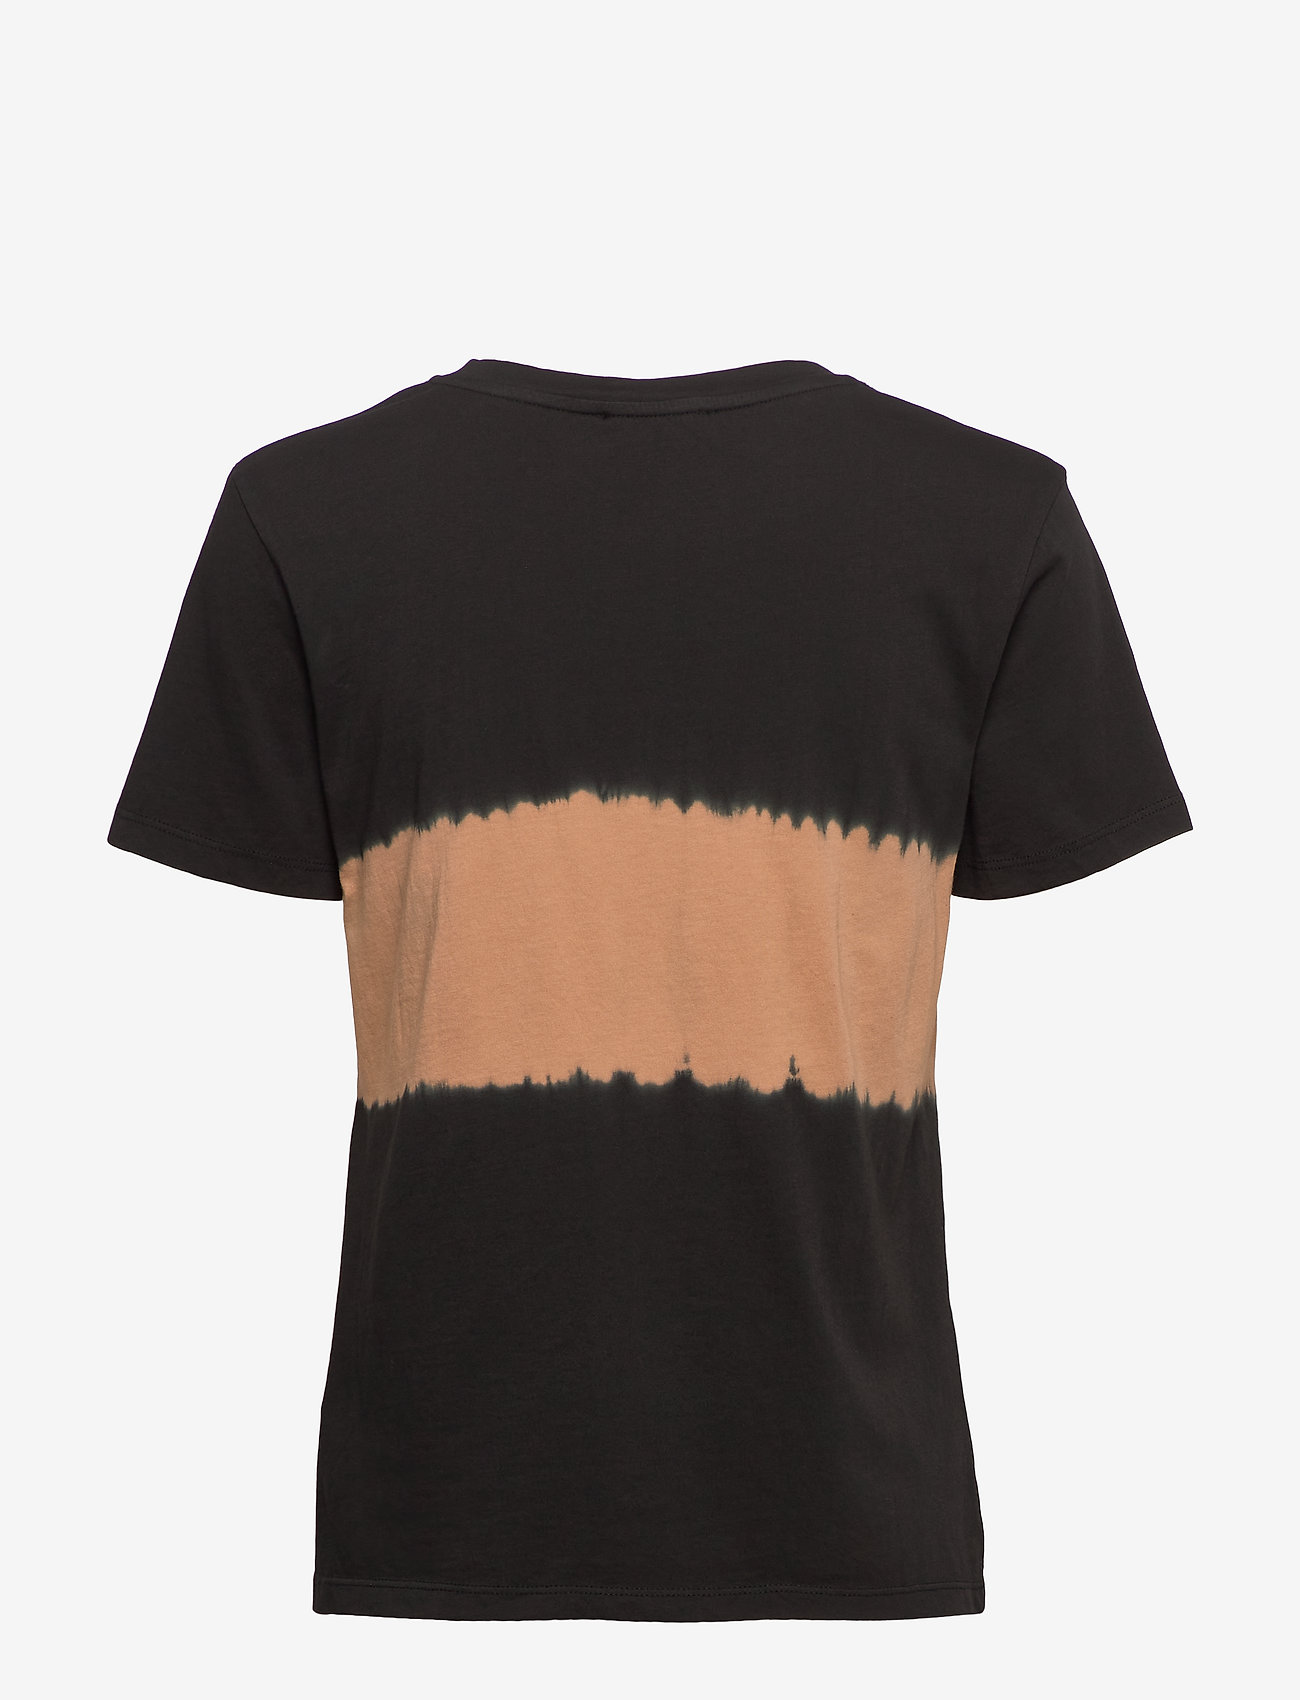 Slsummer Tiedye T-shirt Ss (Black) - Soaked in Luxury slFfVn